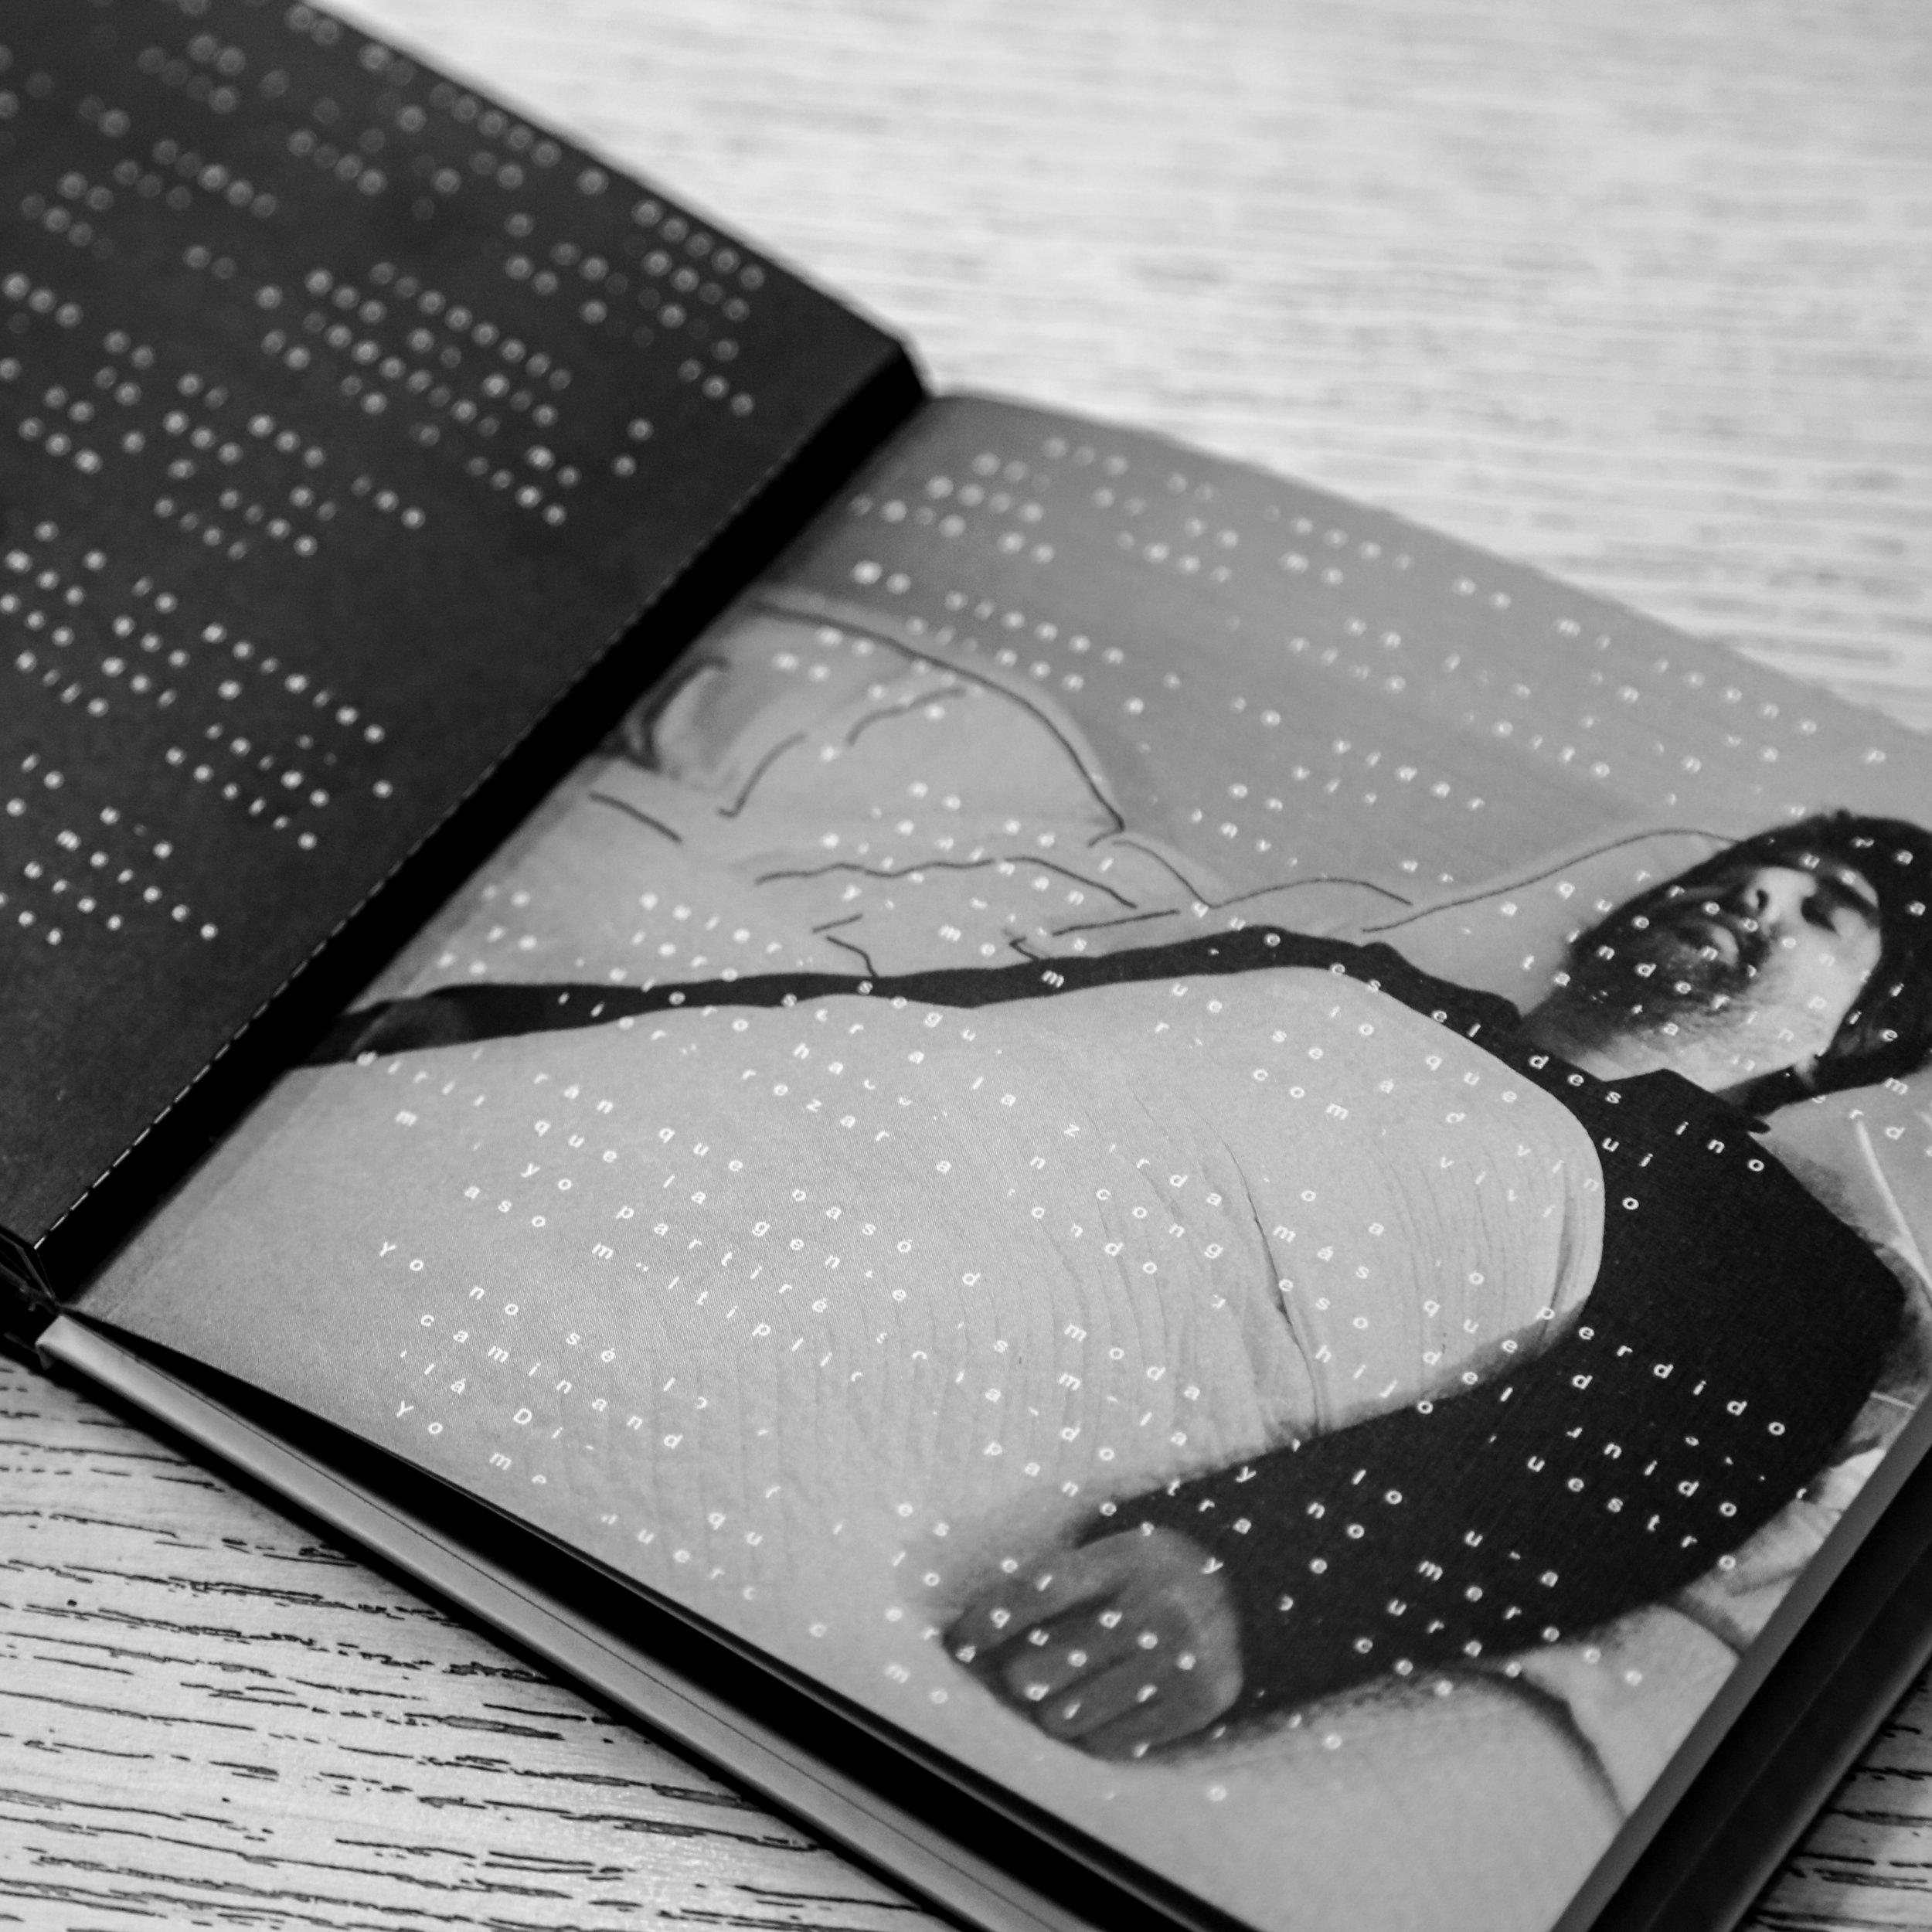 Monocaina Book 29.jpg